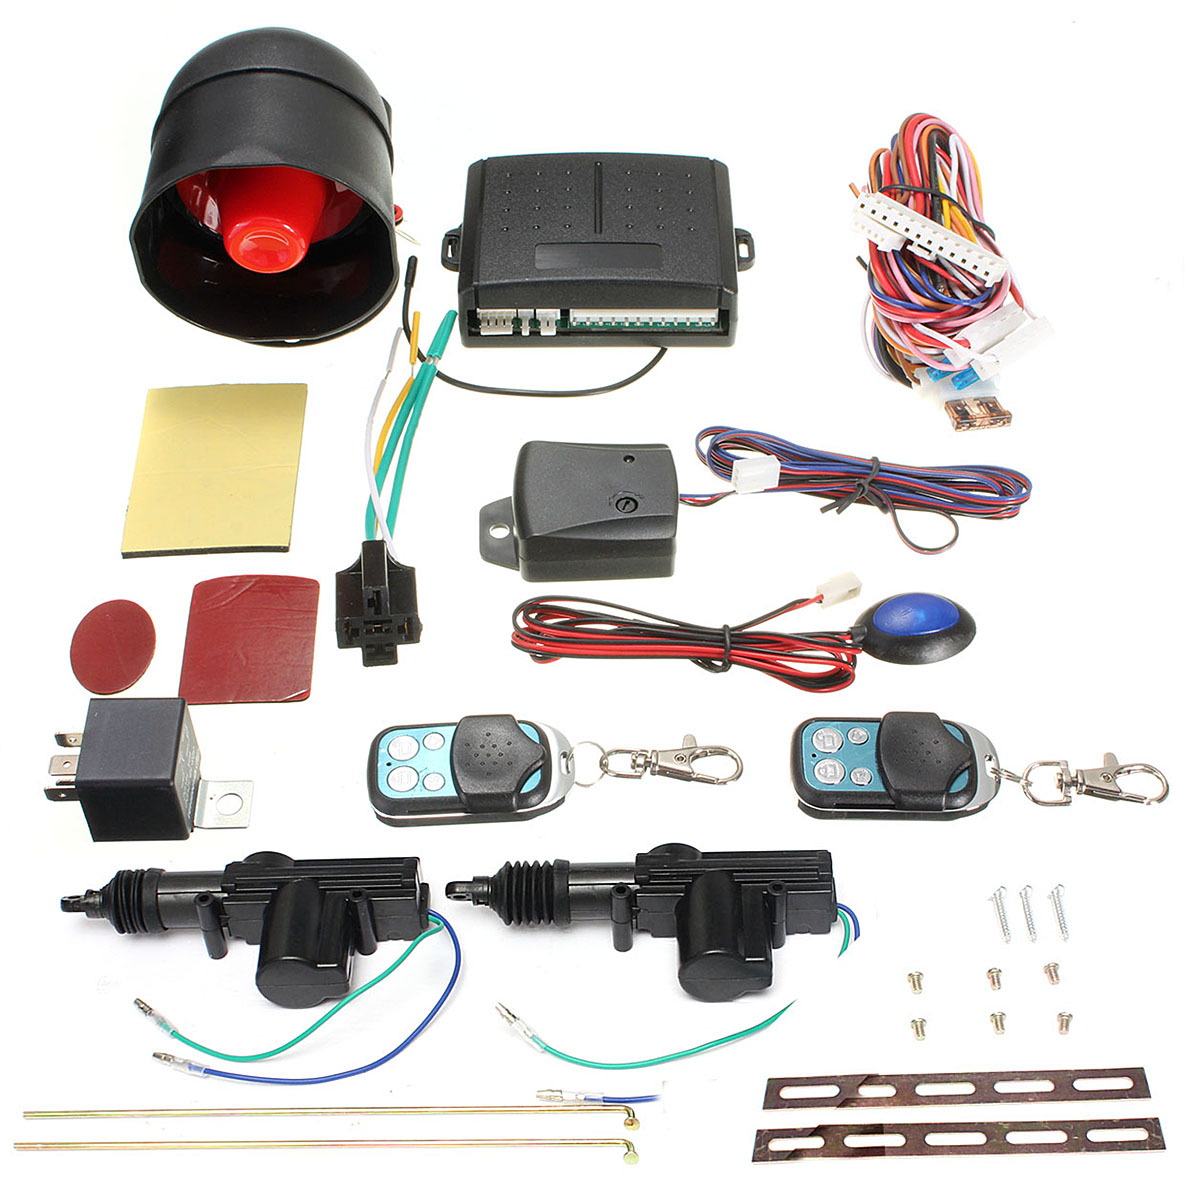 Conjunto de sistemas de alarme carro automático remoto kit central fechadura da porta bloqueio do veículo keyless sistema entrada com controladores remotos